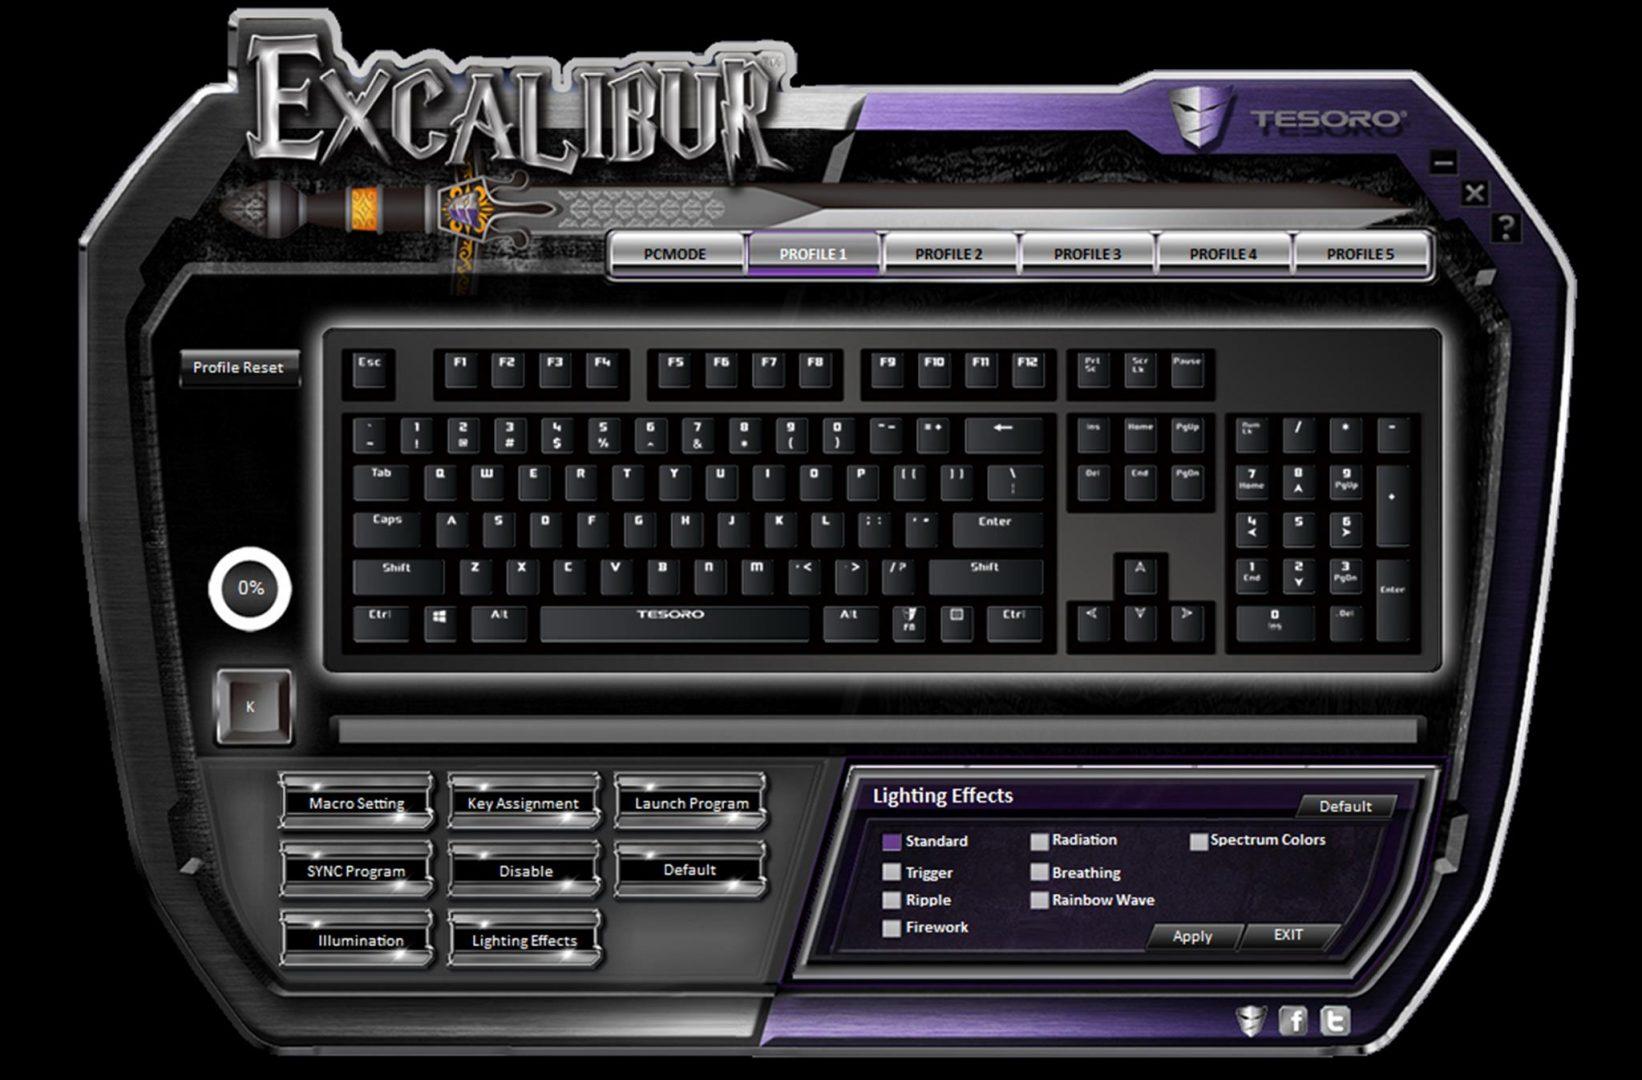 tesoro excalibur spectrum software 4